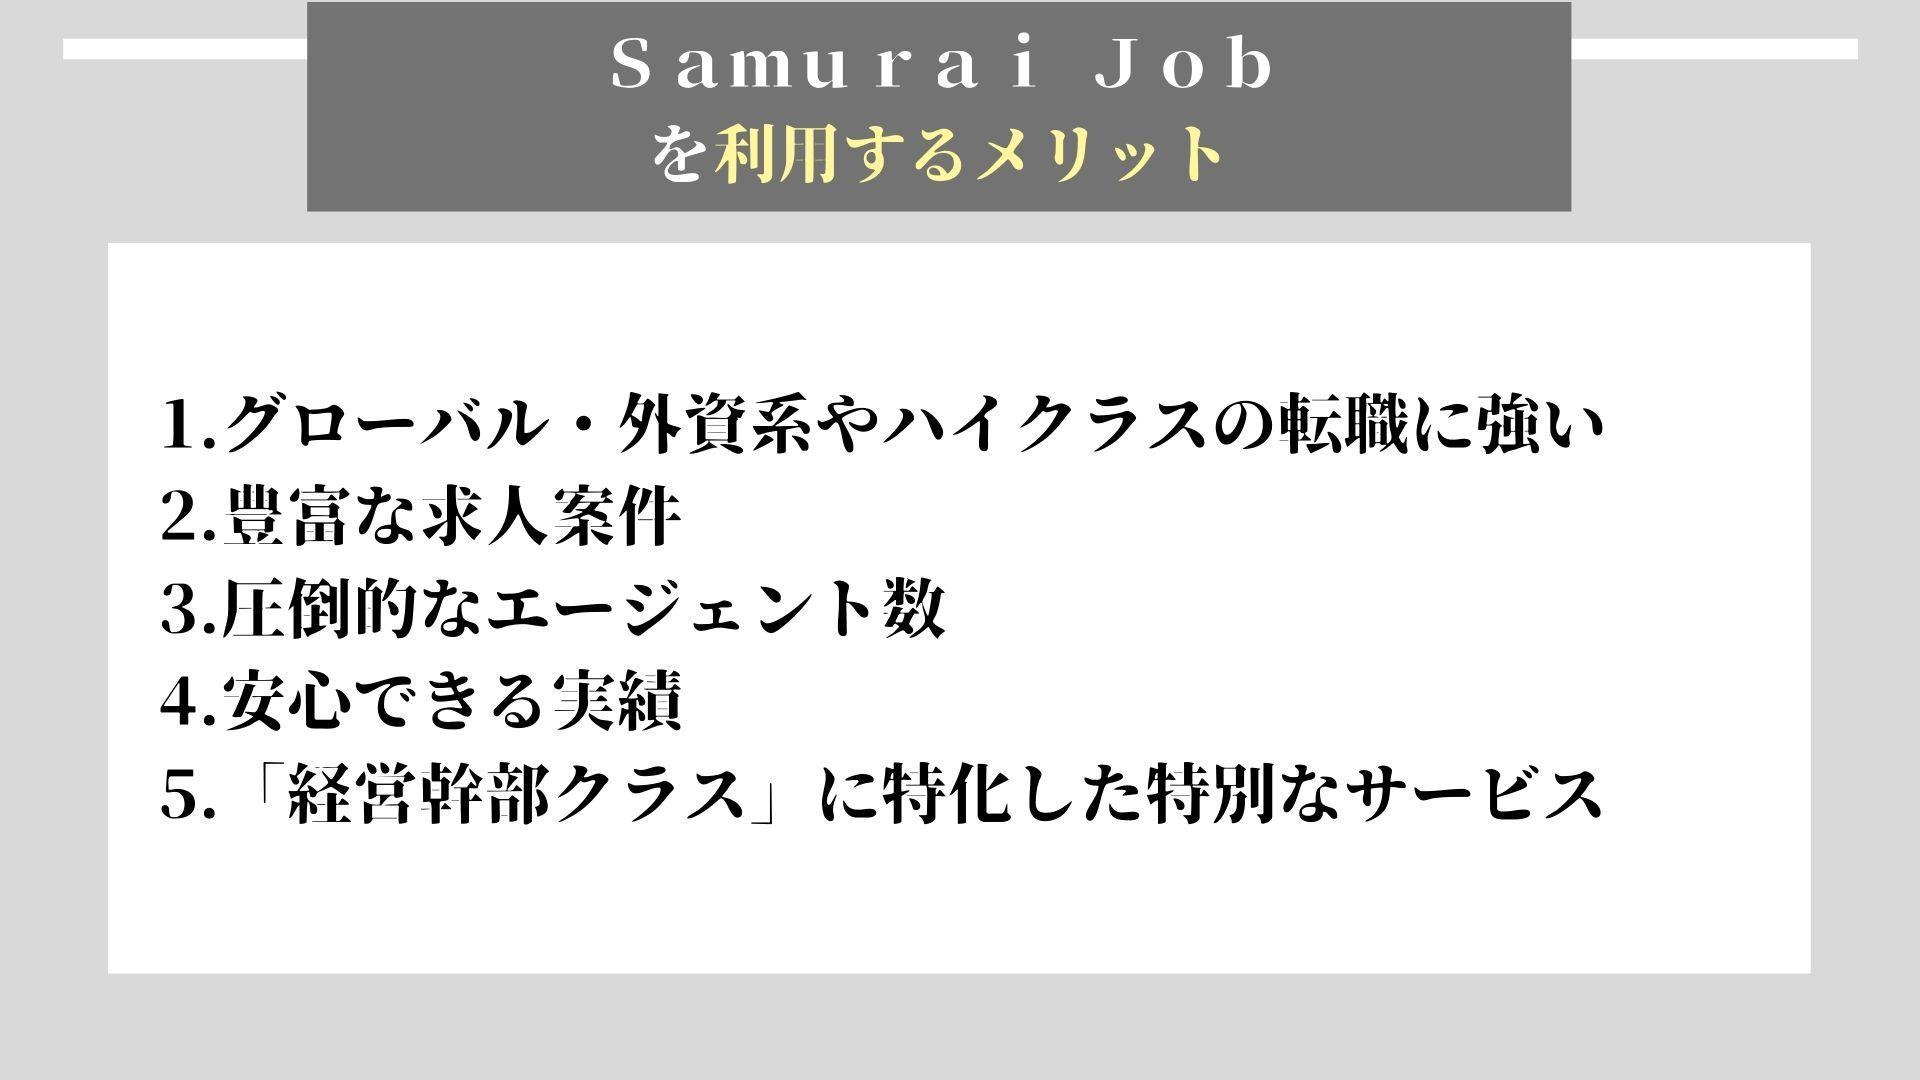 Samurai Job メリット